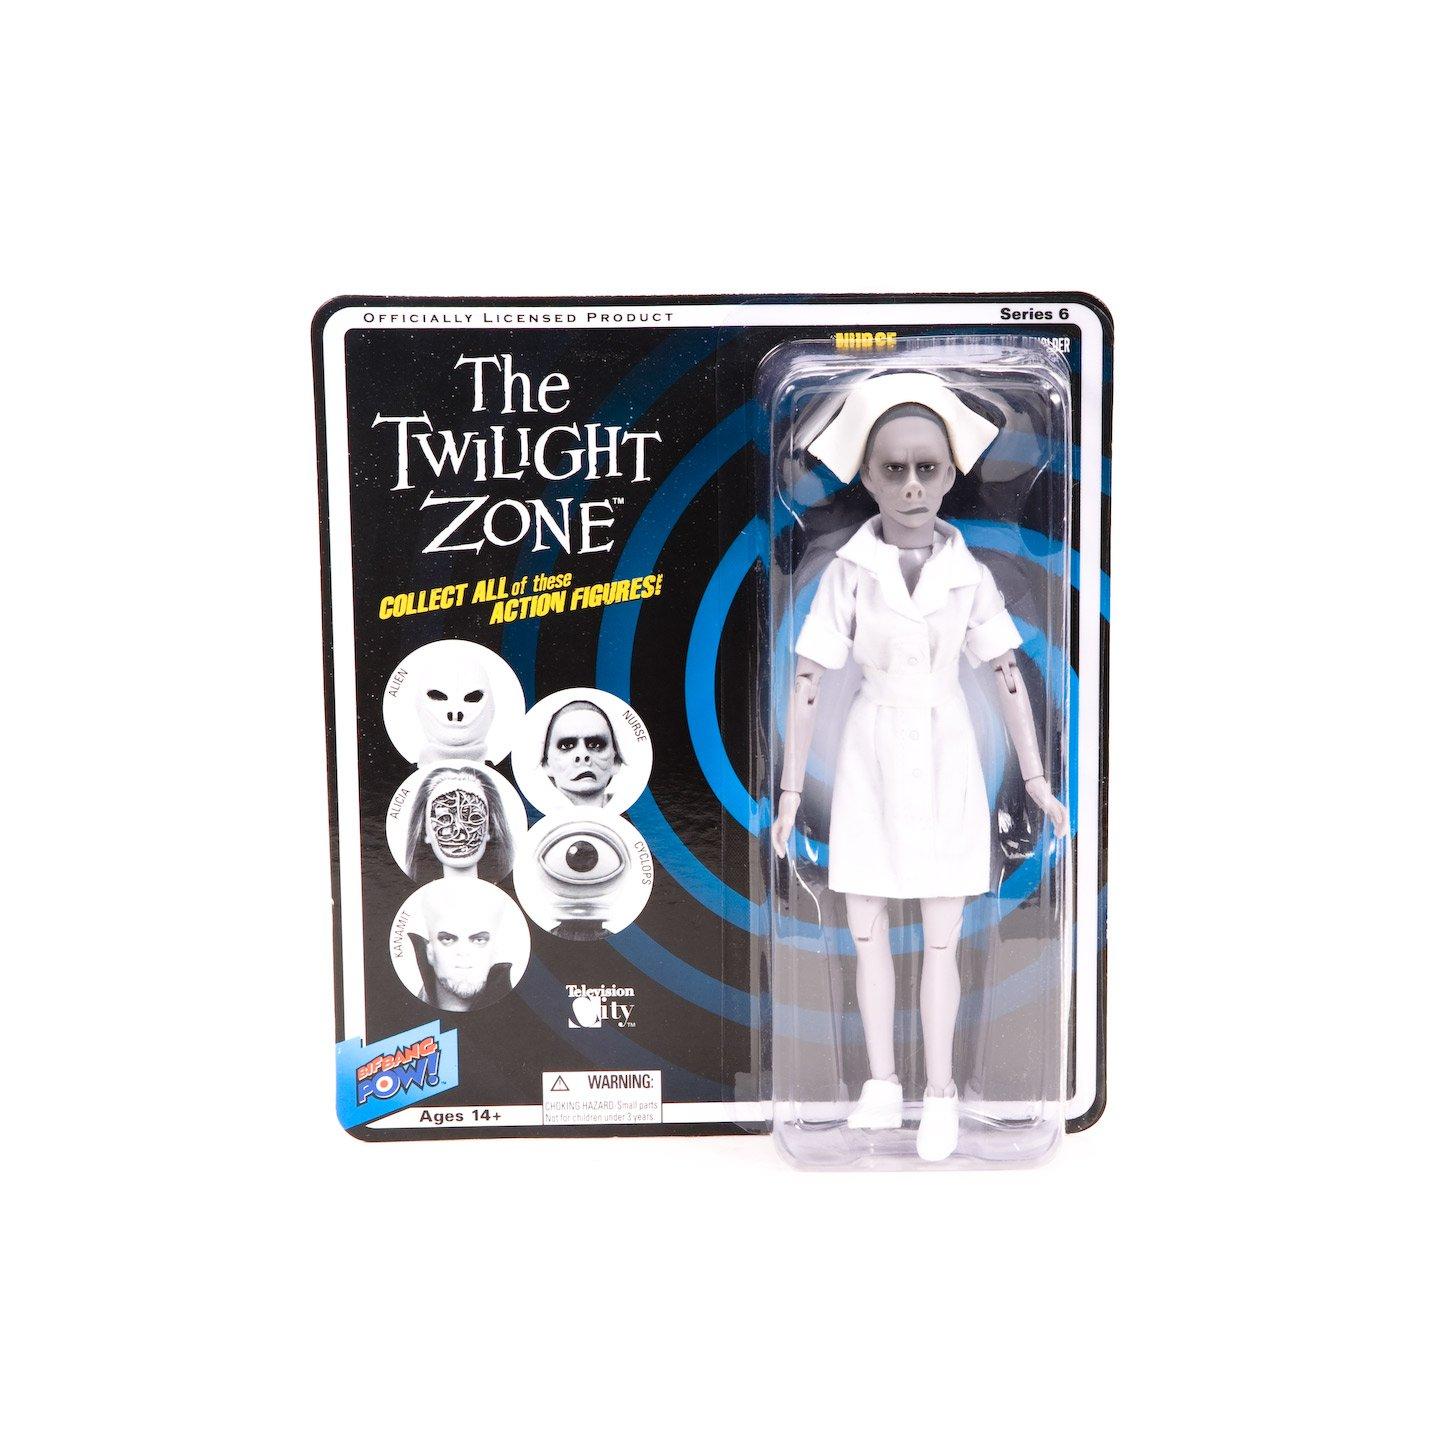 Bif Bang Pow! Twilight Zone Series 6 Action Figure Nurse